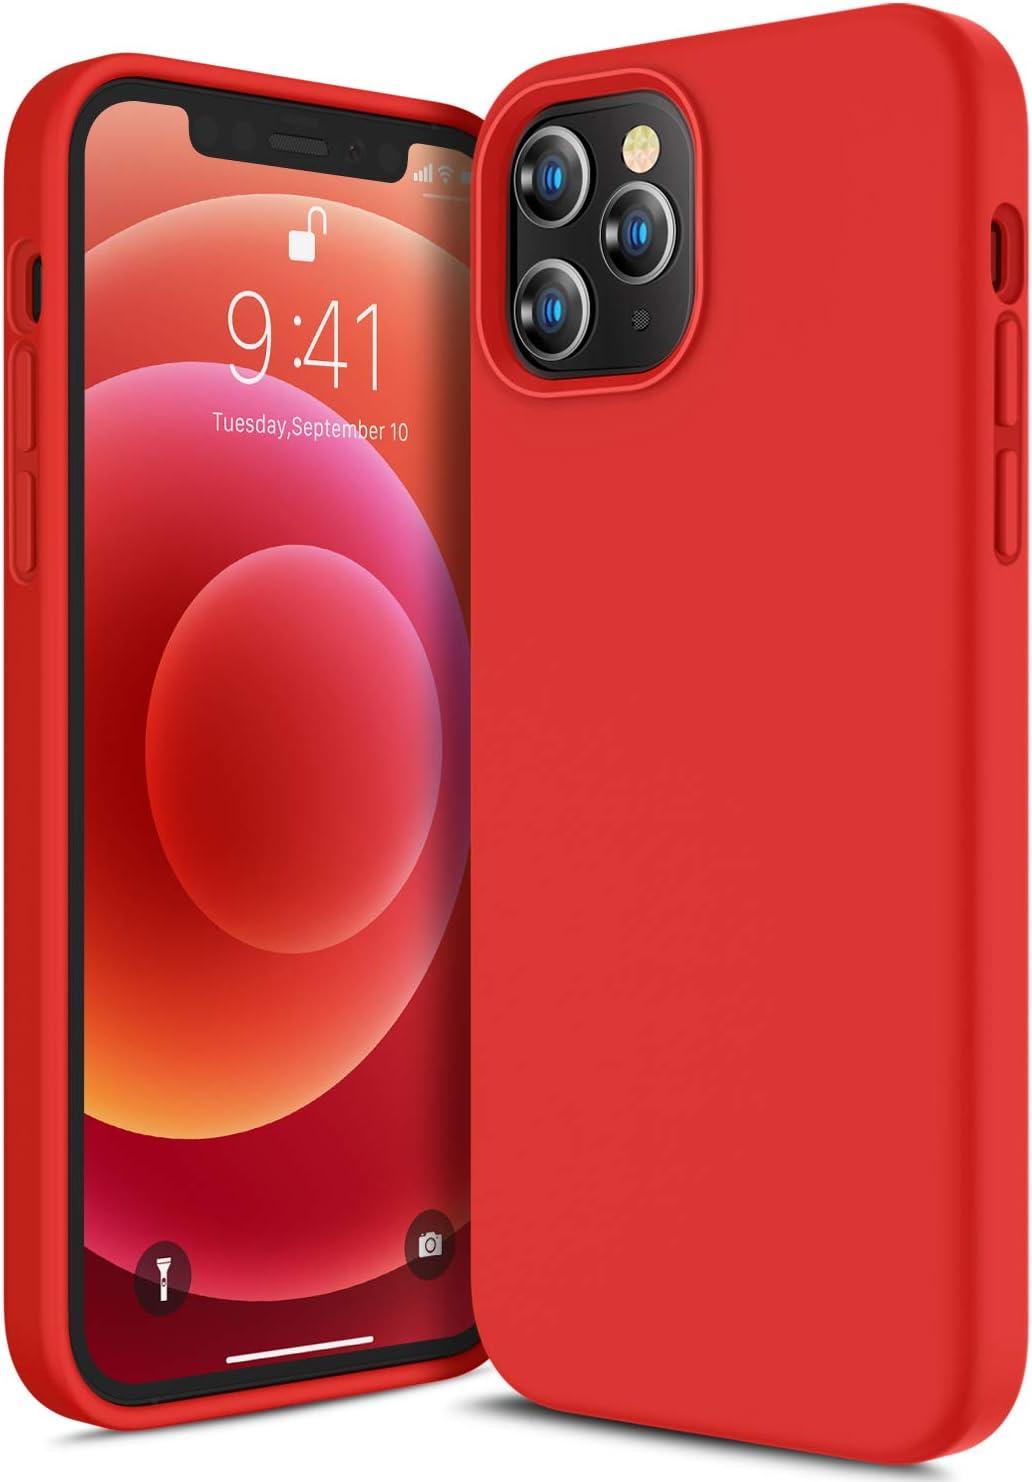 Canshn Liquid Silikon Hülle Kompatibel Mit Iphone 12 Elektronik